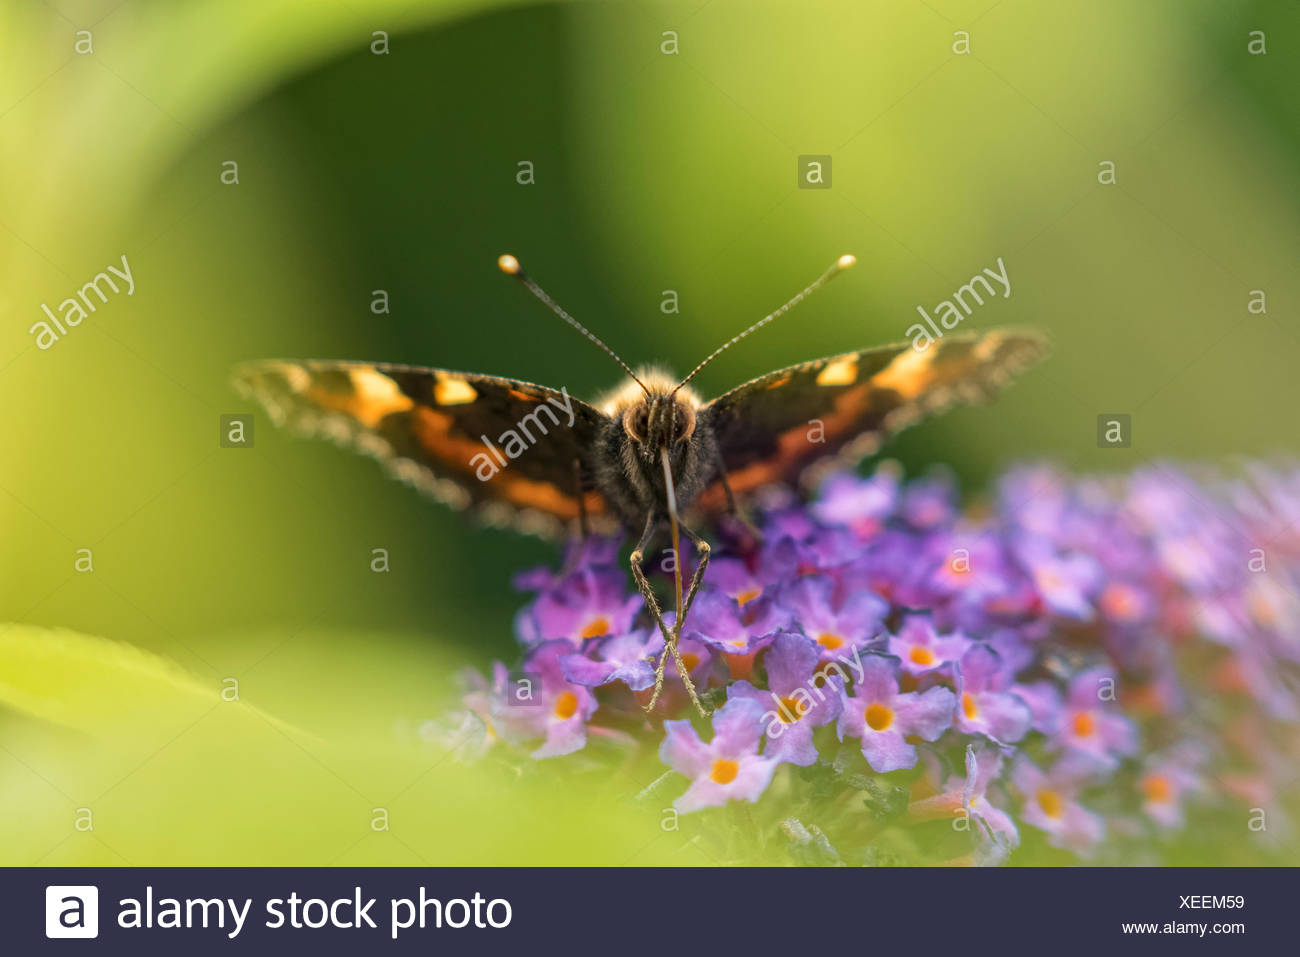 Small fox (Nymphalis urticae) on butterflies (Buddleja), garden, Oelsnitz in the Vogtland, Saxony, Germany - Stock Image